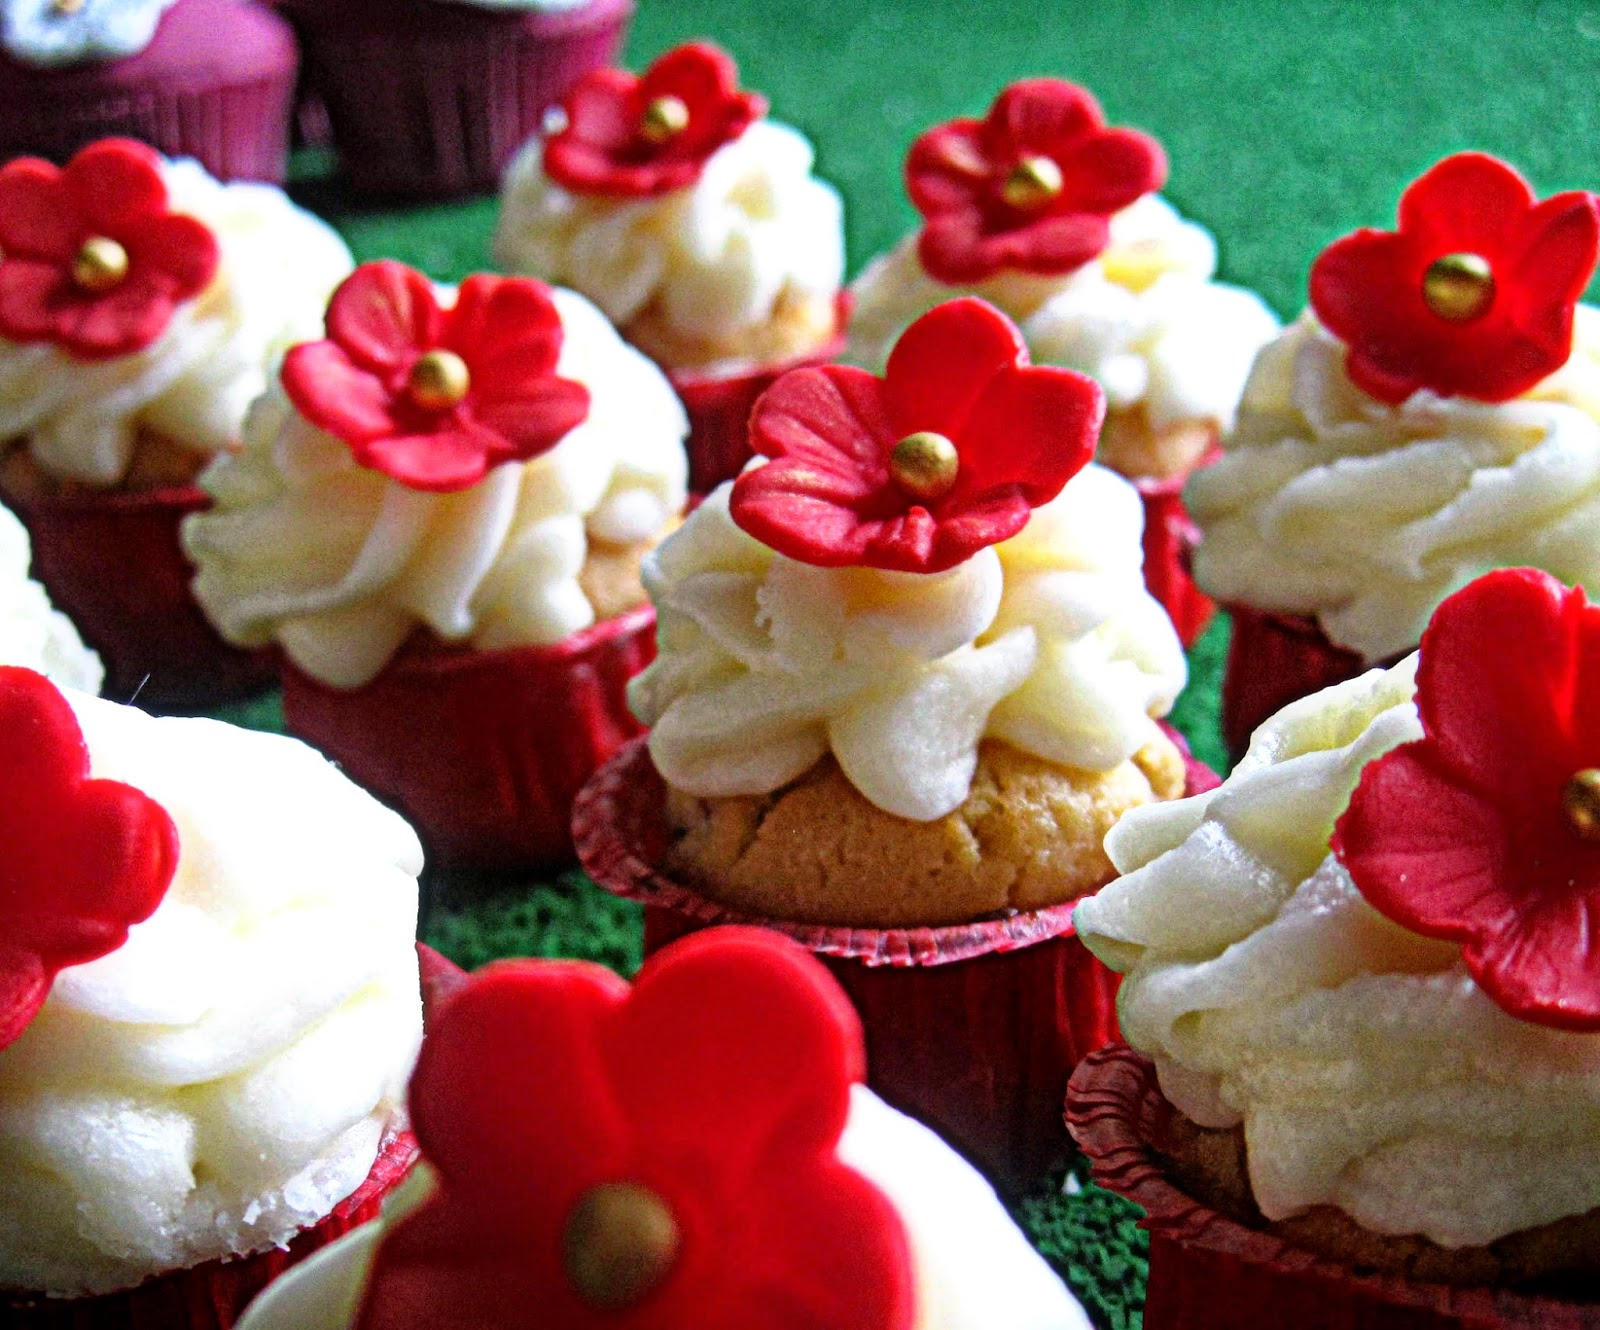 http://cupcakeluvs.blogspot.dk/2014/05/honing-mandel-rose-cupcakes-honey.html